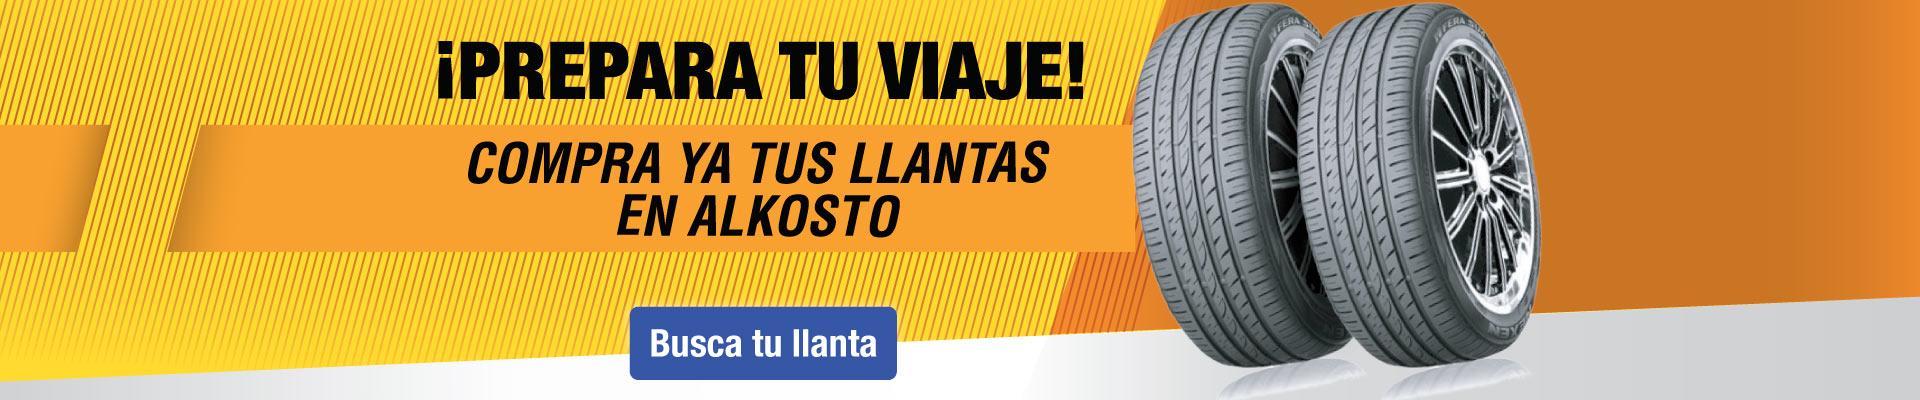 PPAL-AK-13-Llantas-Busca-tu-llanta-Dic2-8